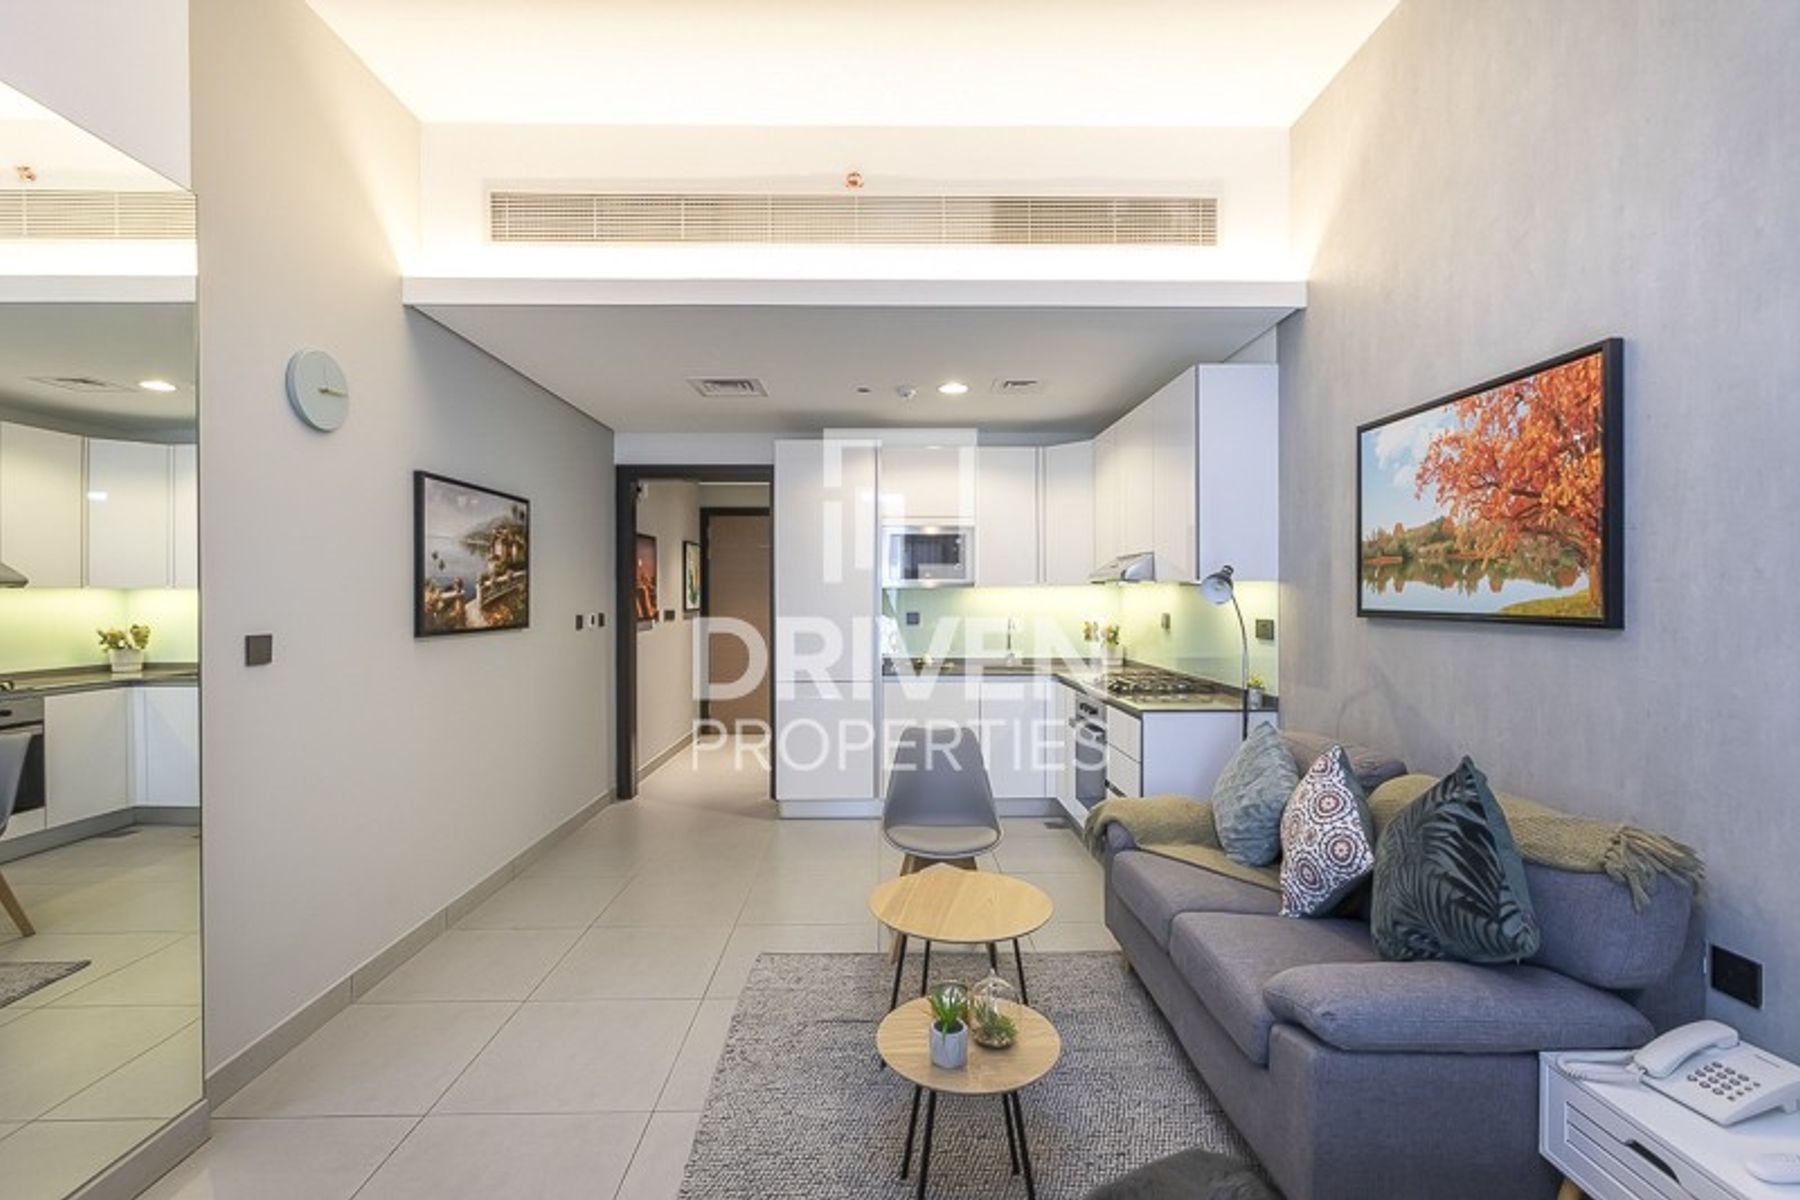 Studio for Sale in Rigel, Jumeirah Village Circle